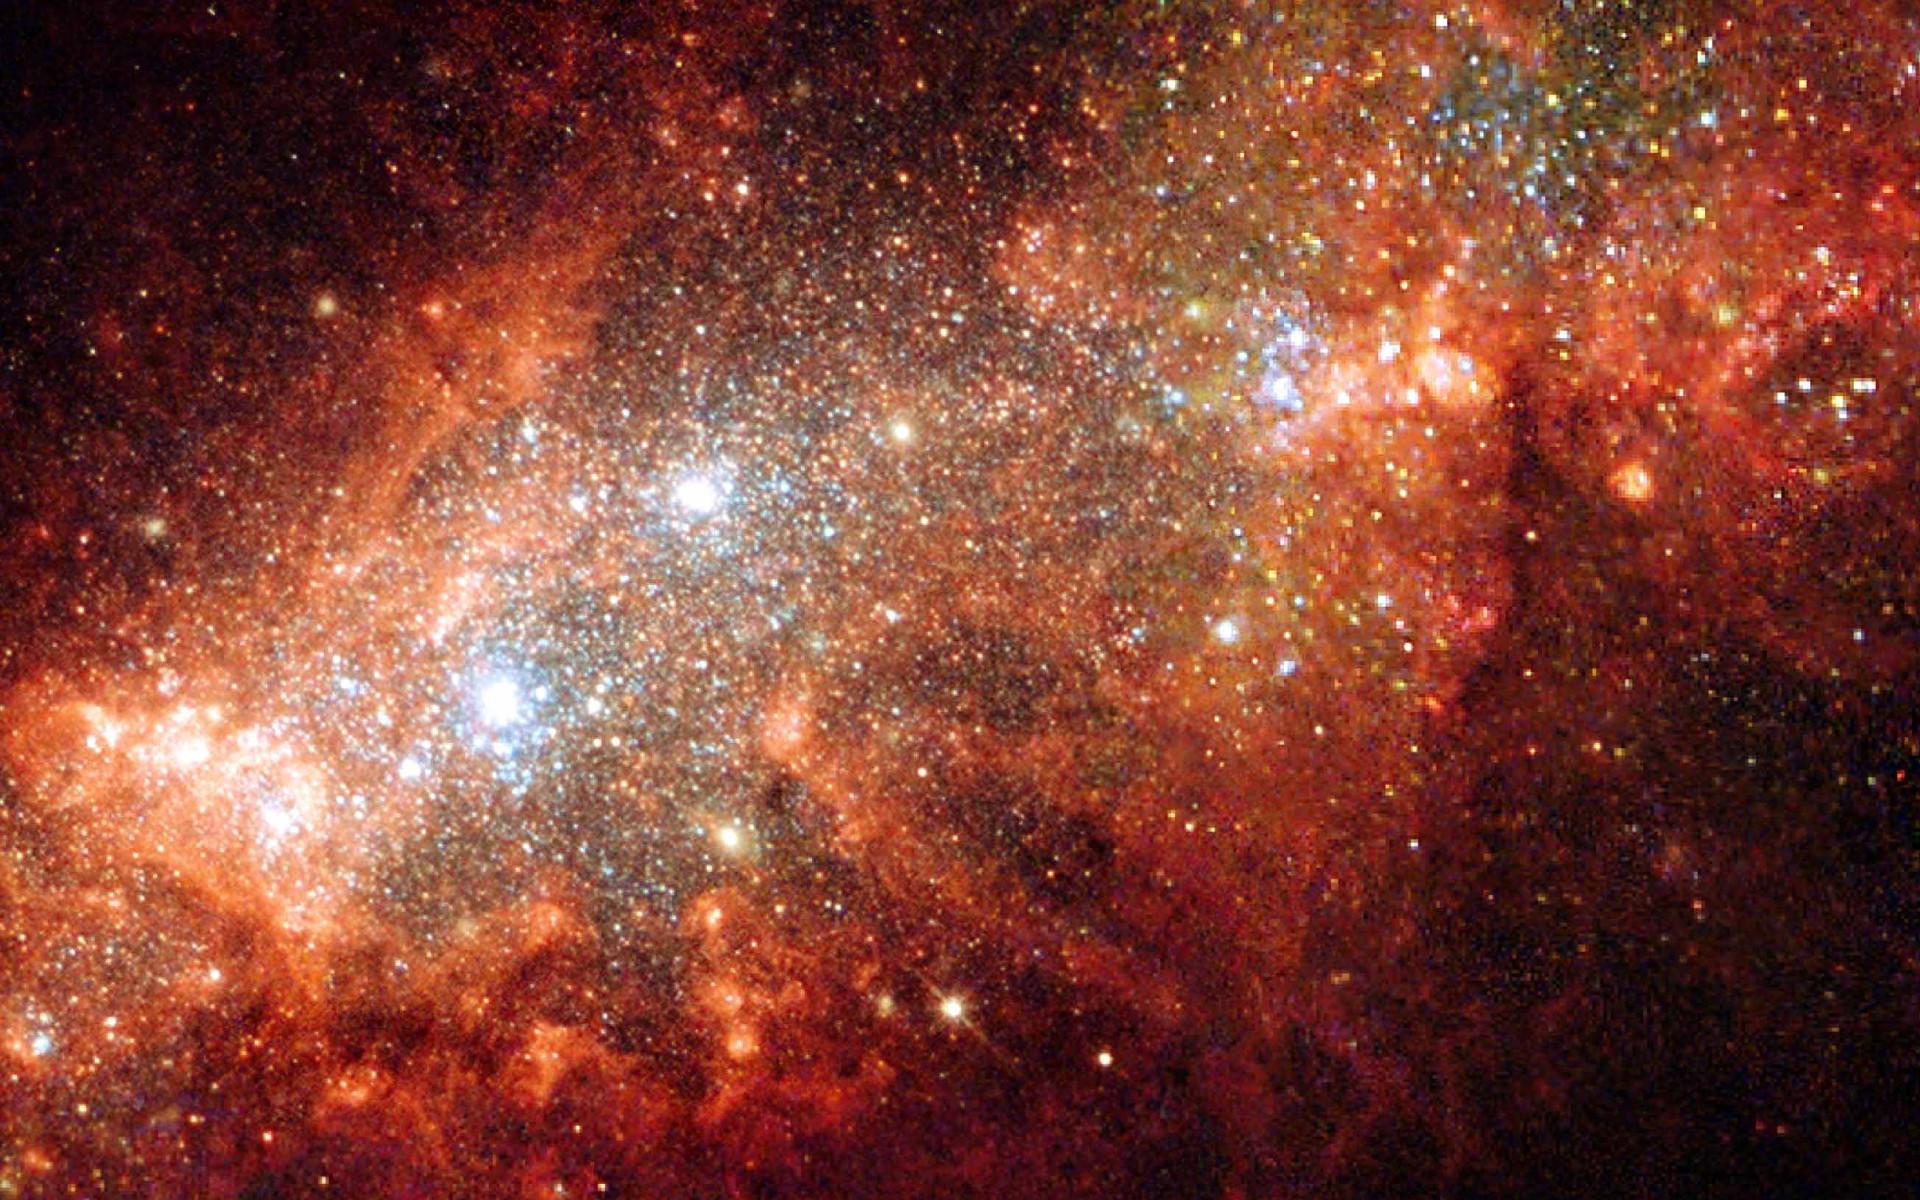 … Hubble Telescope Wallpaper Desktop …